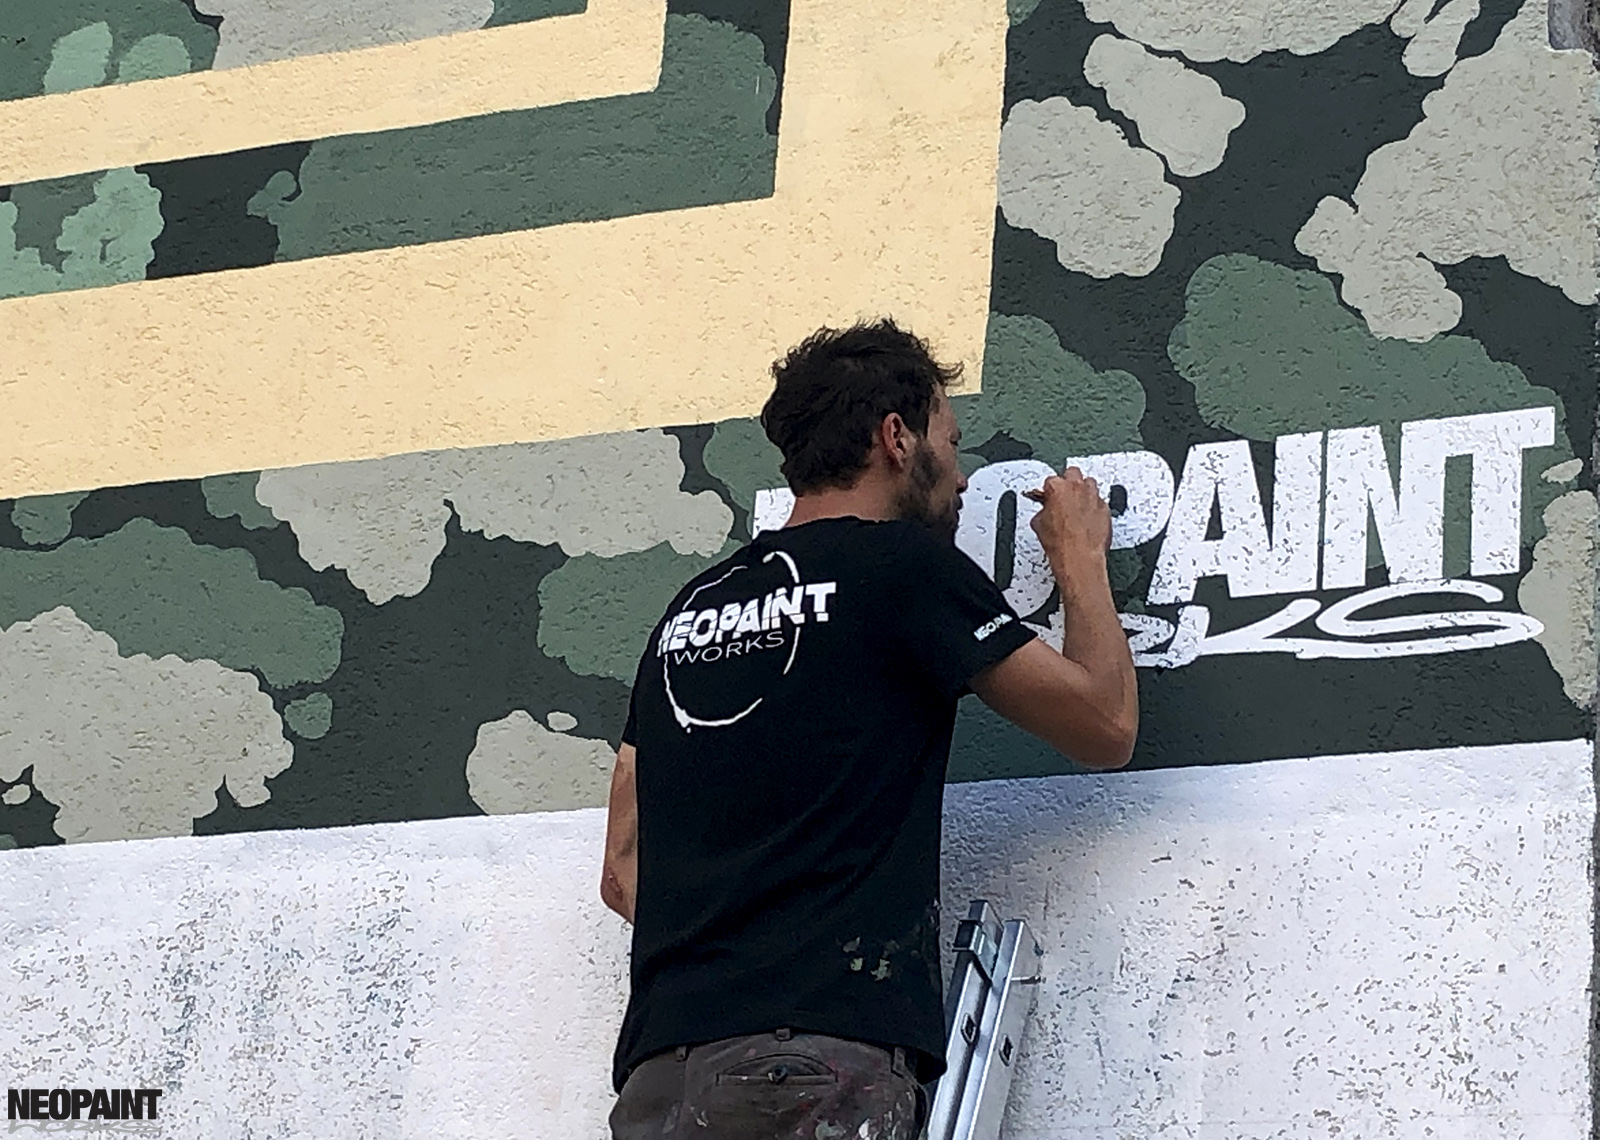 neopaint works - tűzfalfestés - mural painting - converse - cityforest